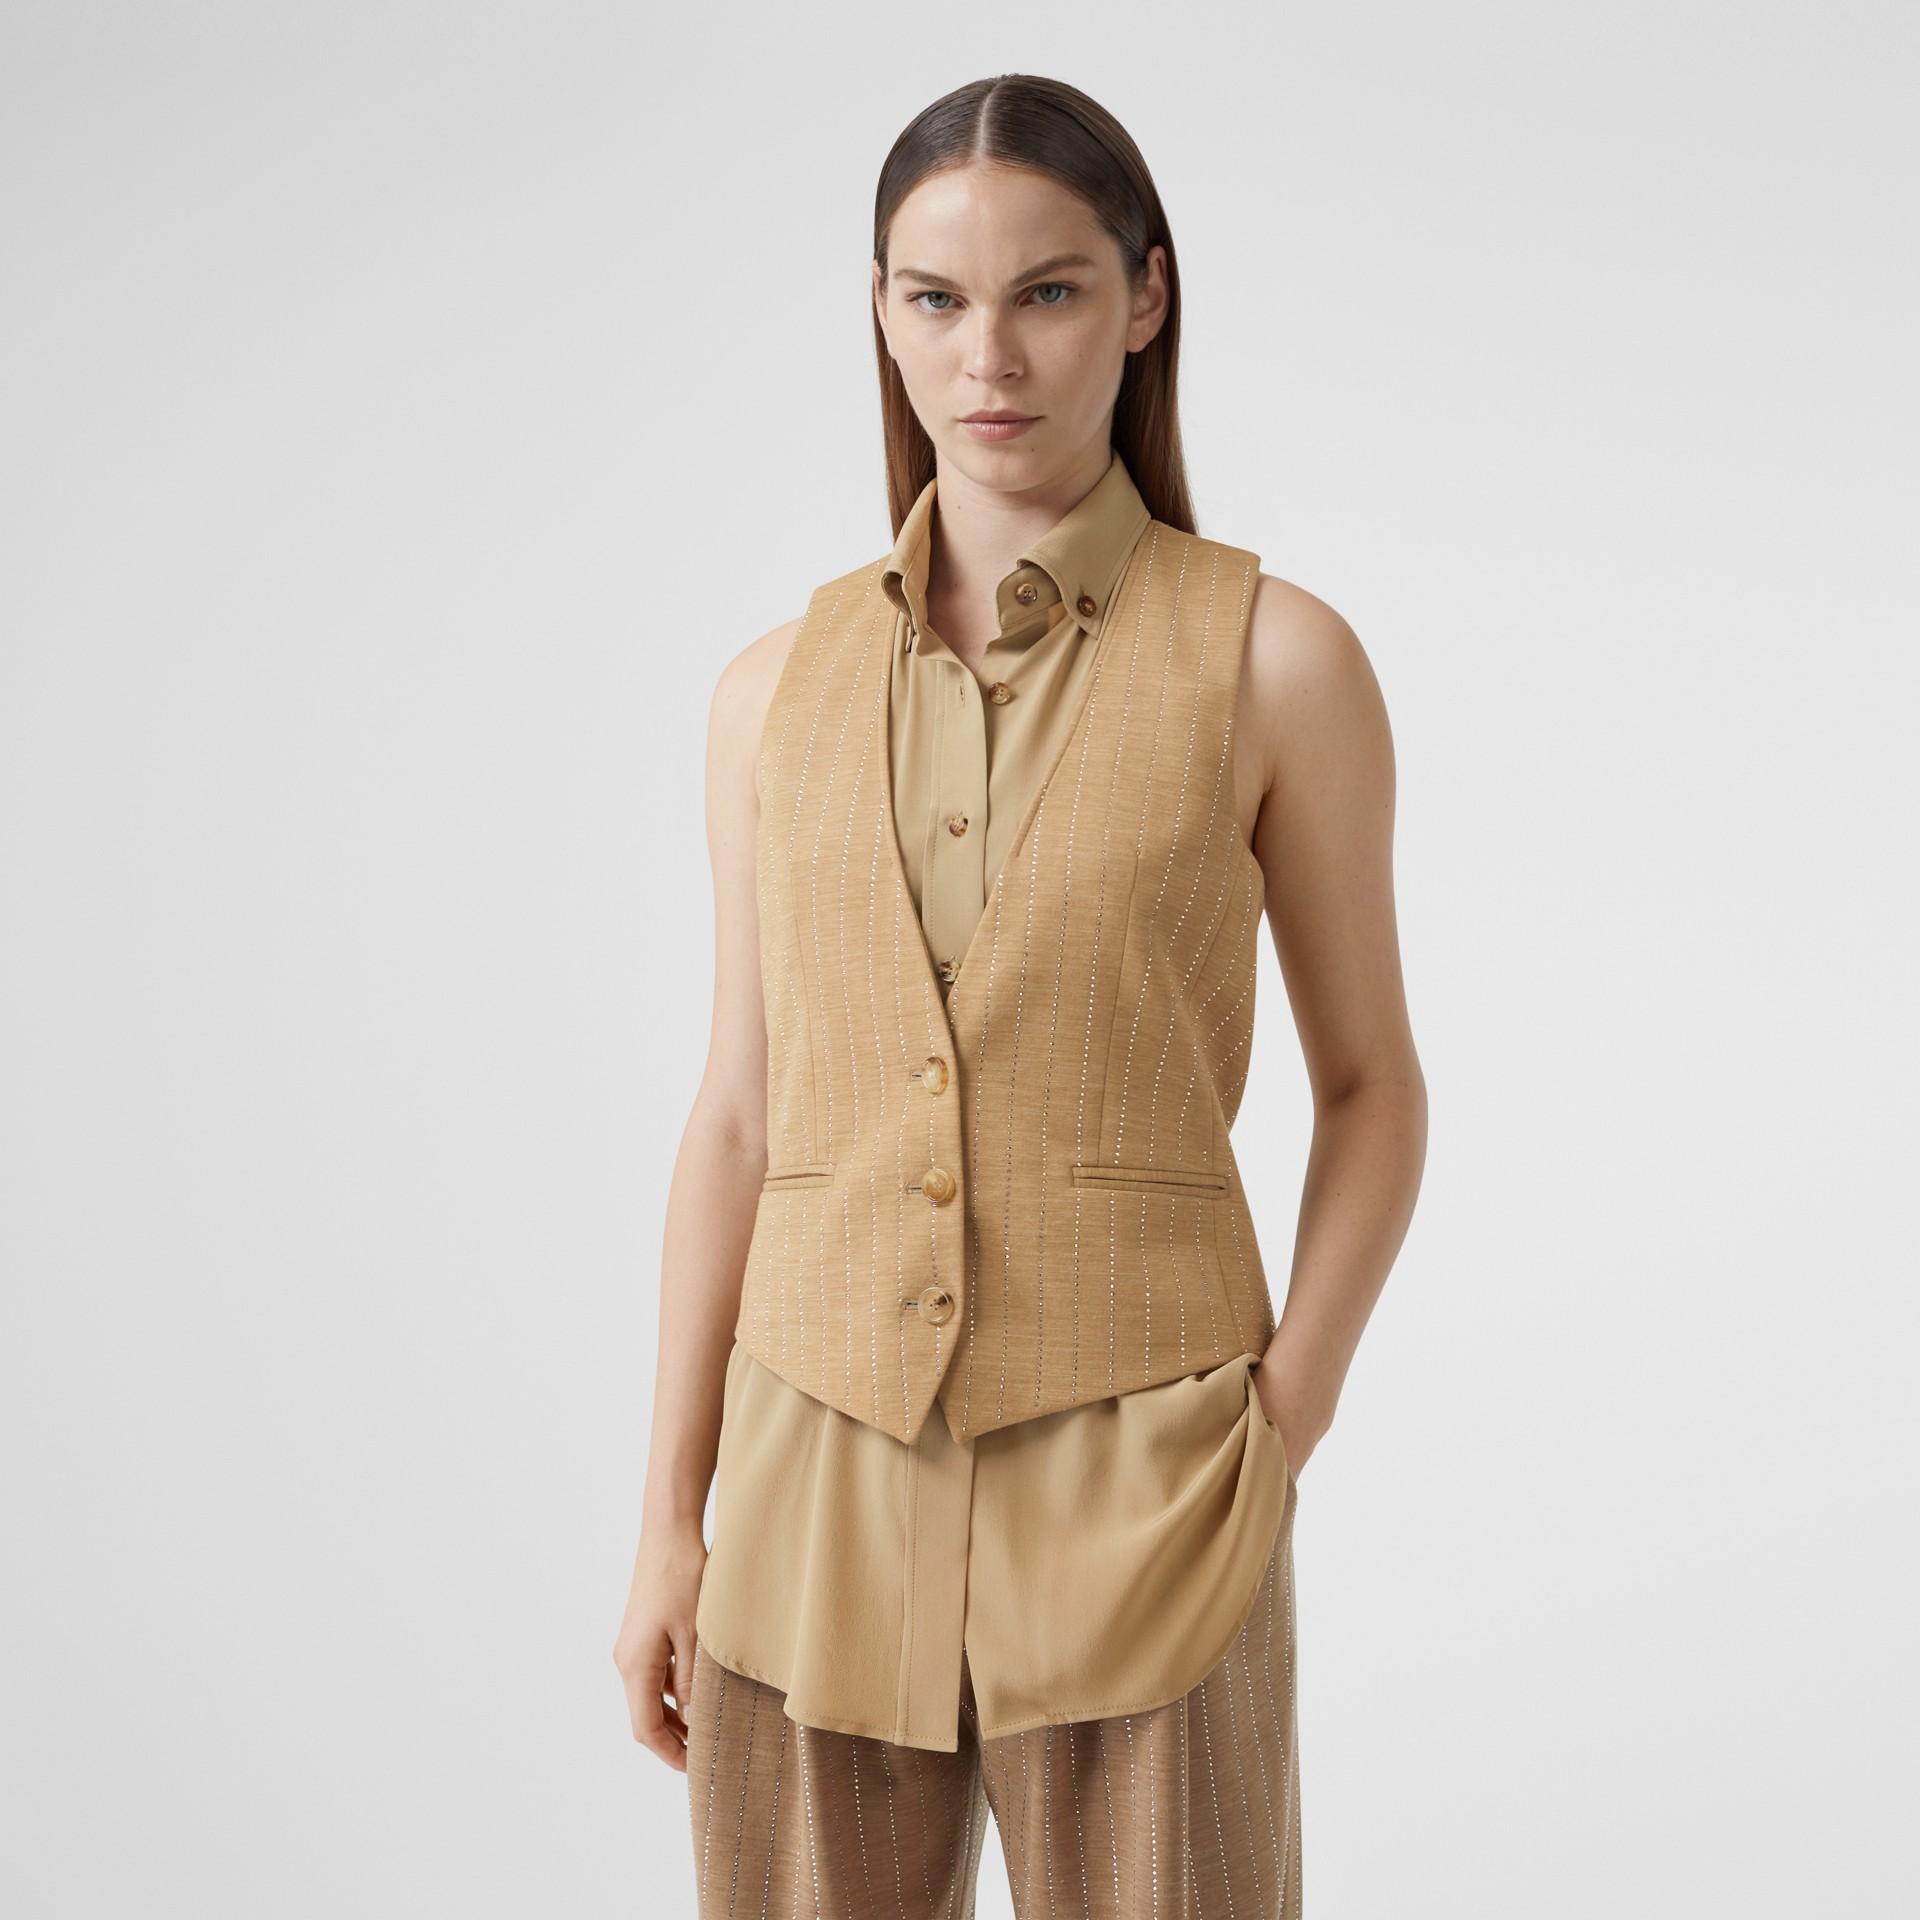 Shirt Detail Crystal Pinstriped Wool Blend Waistcoat in Pecan Melange - Women | Burberry - gallery image 4